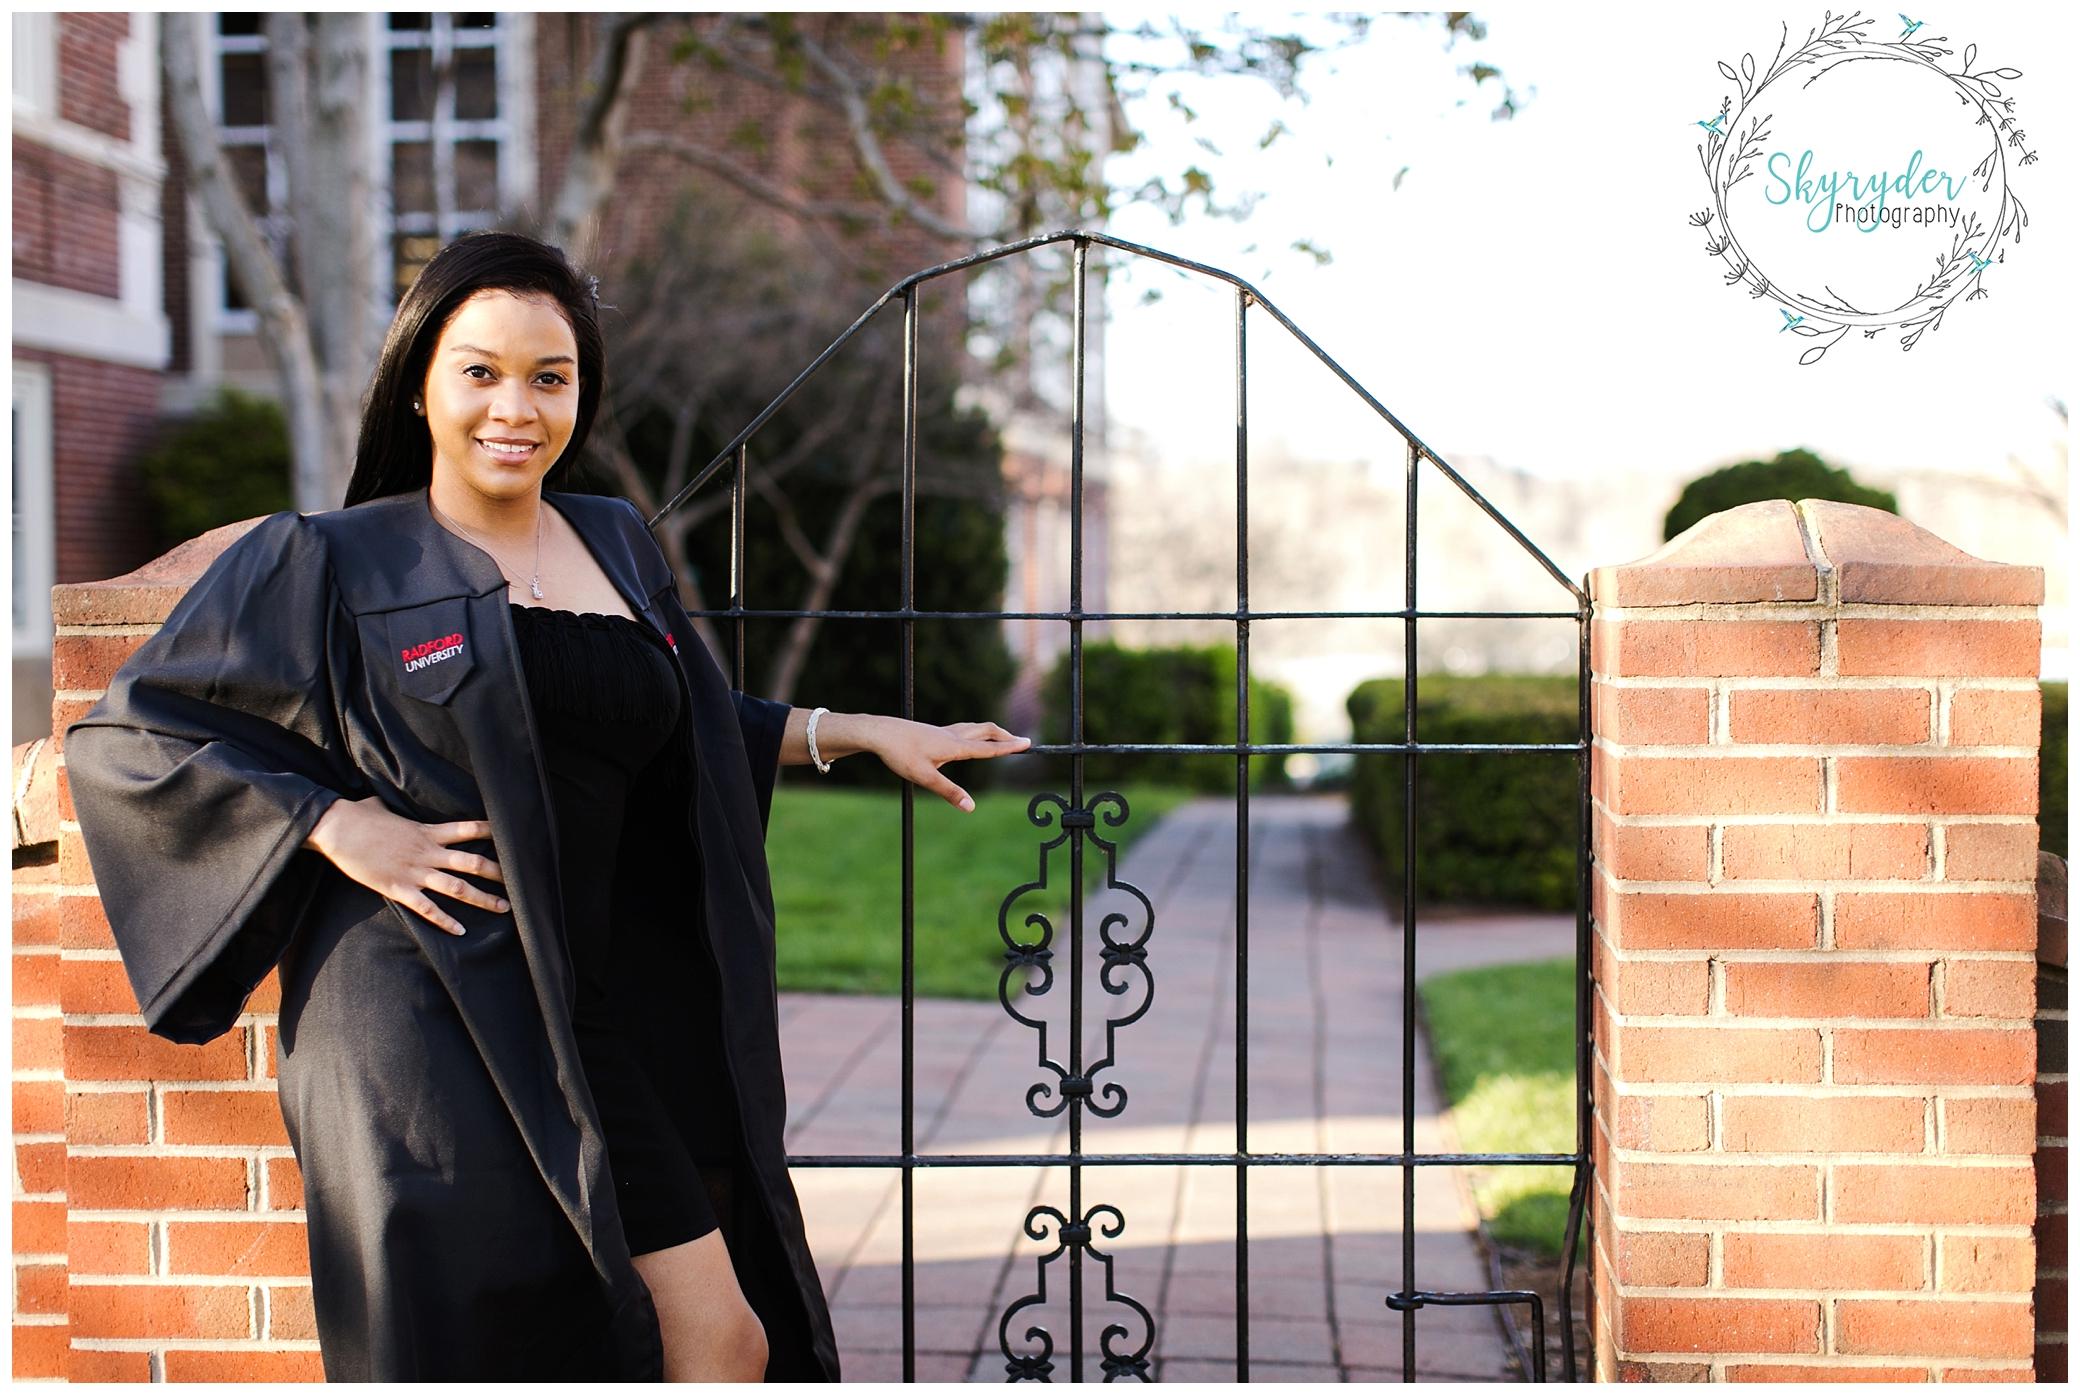 high school senior radford college university blacksburg photographer photography roanoke skyryder virginia